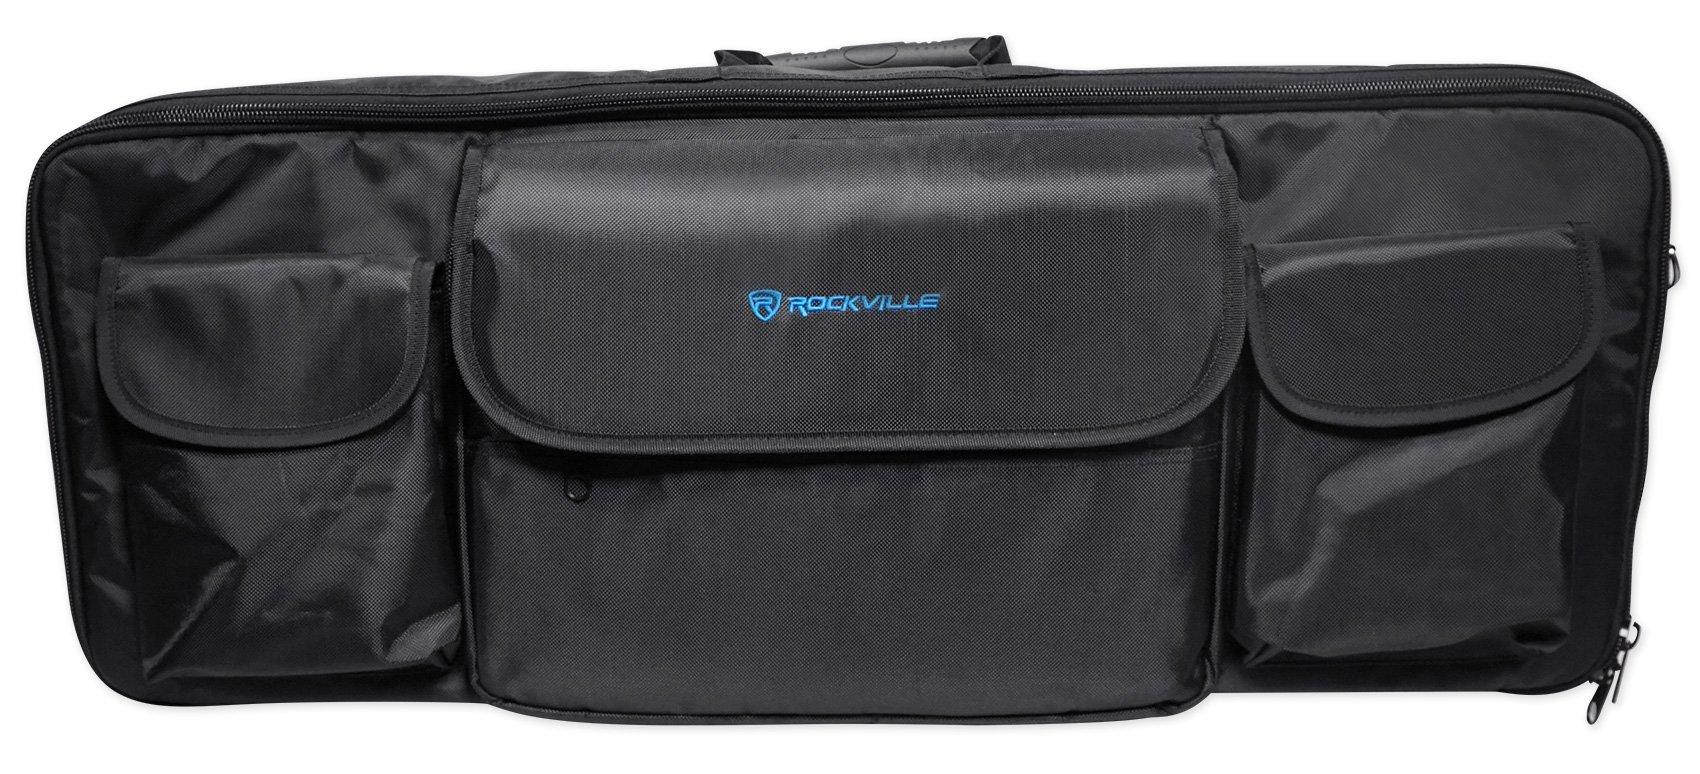 Rockville Carry Bag Case For M-Audio Code 49 Keyboard Controller